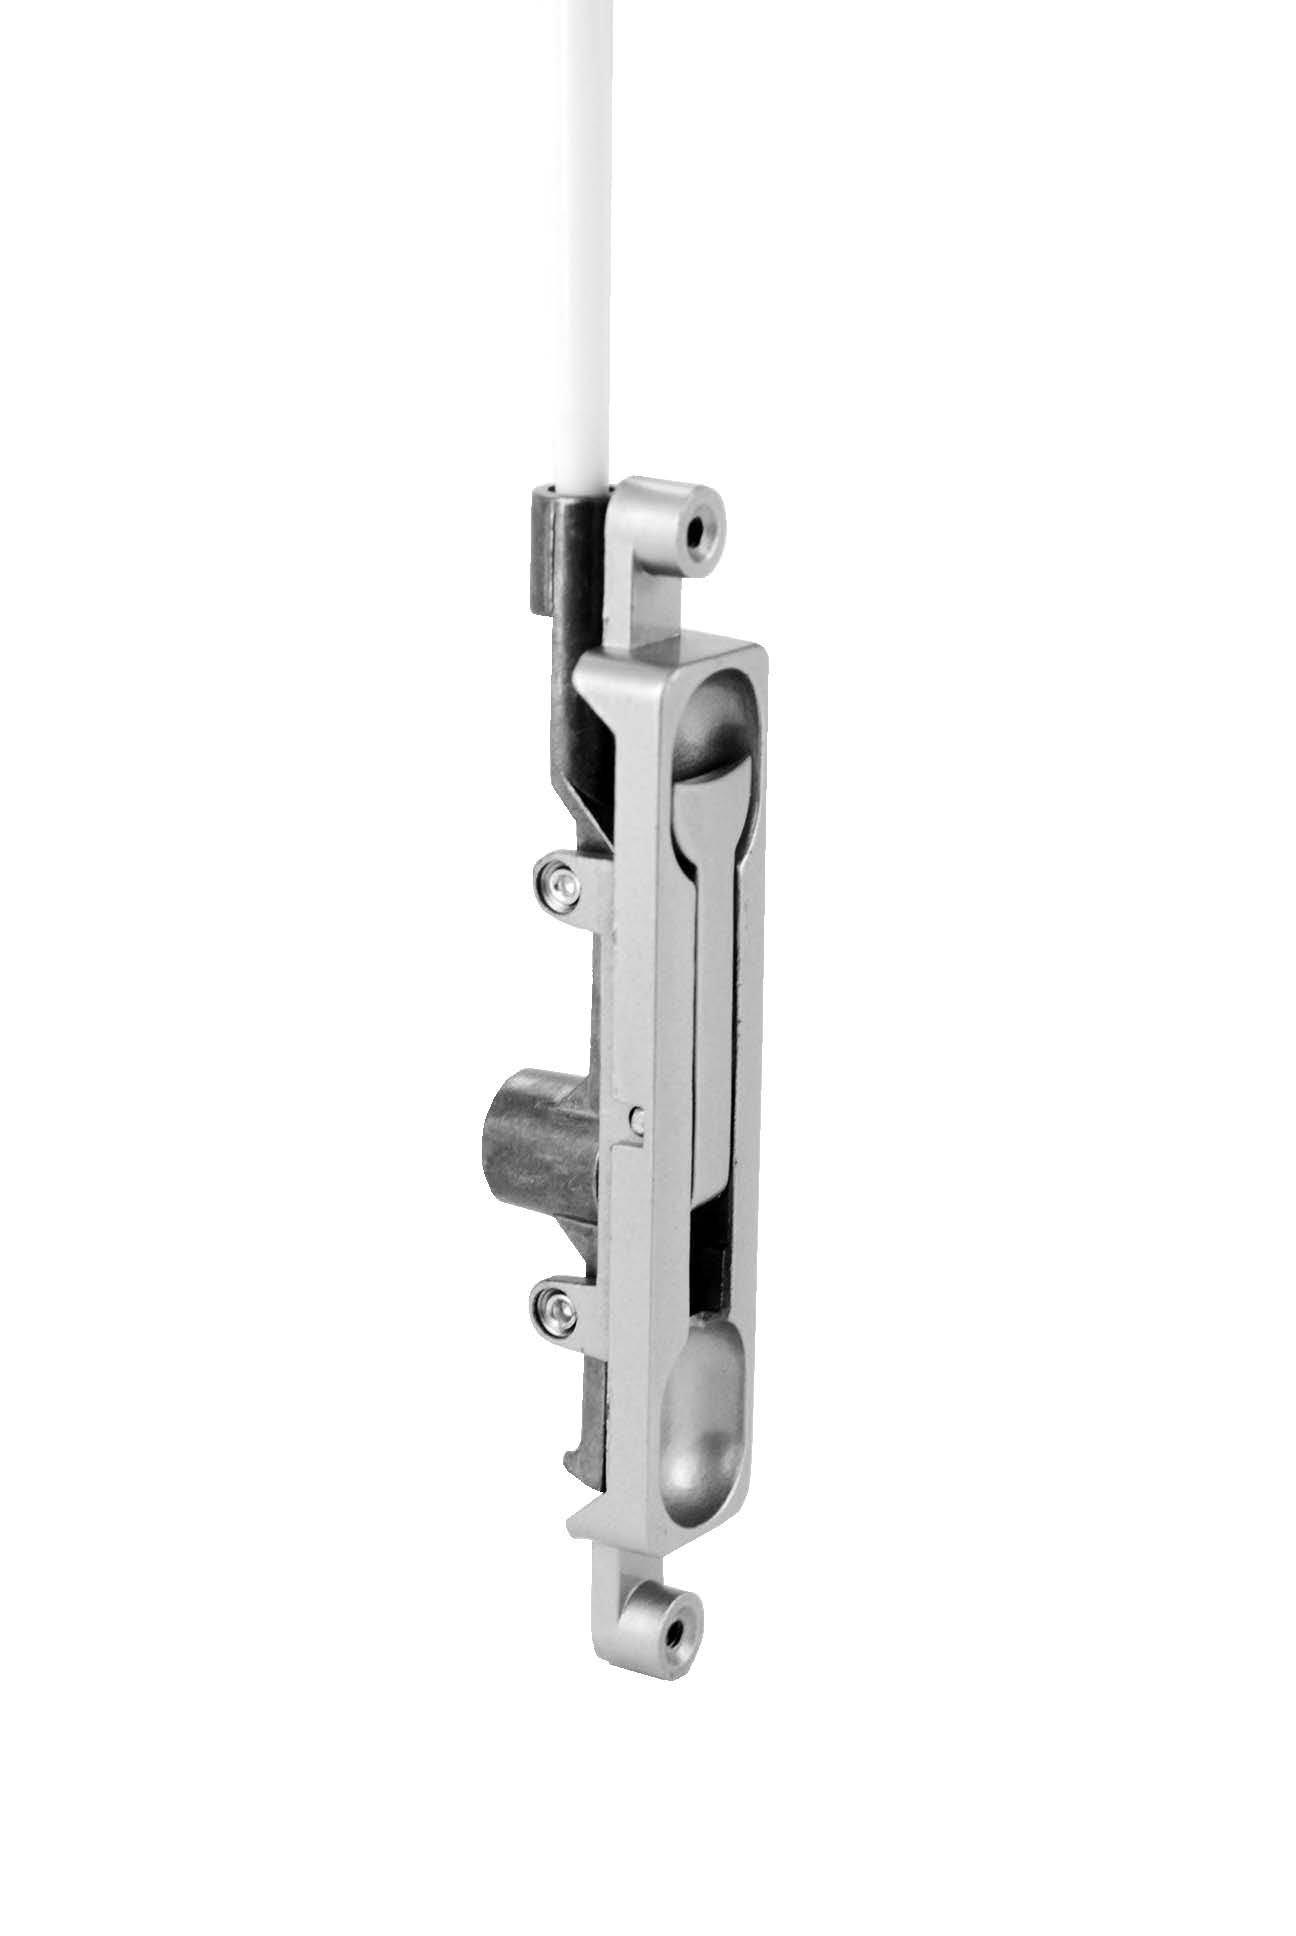 Don-Jo 1550-DU Aluminum Door Flush Bolt, Duro Coated, 1/8'' Offset, 15/16'' Width x 4-1/4'' Height (Pack of 10)